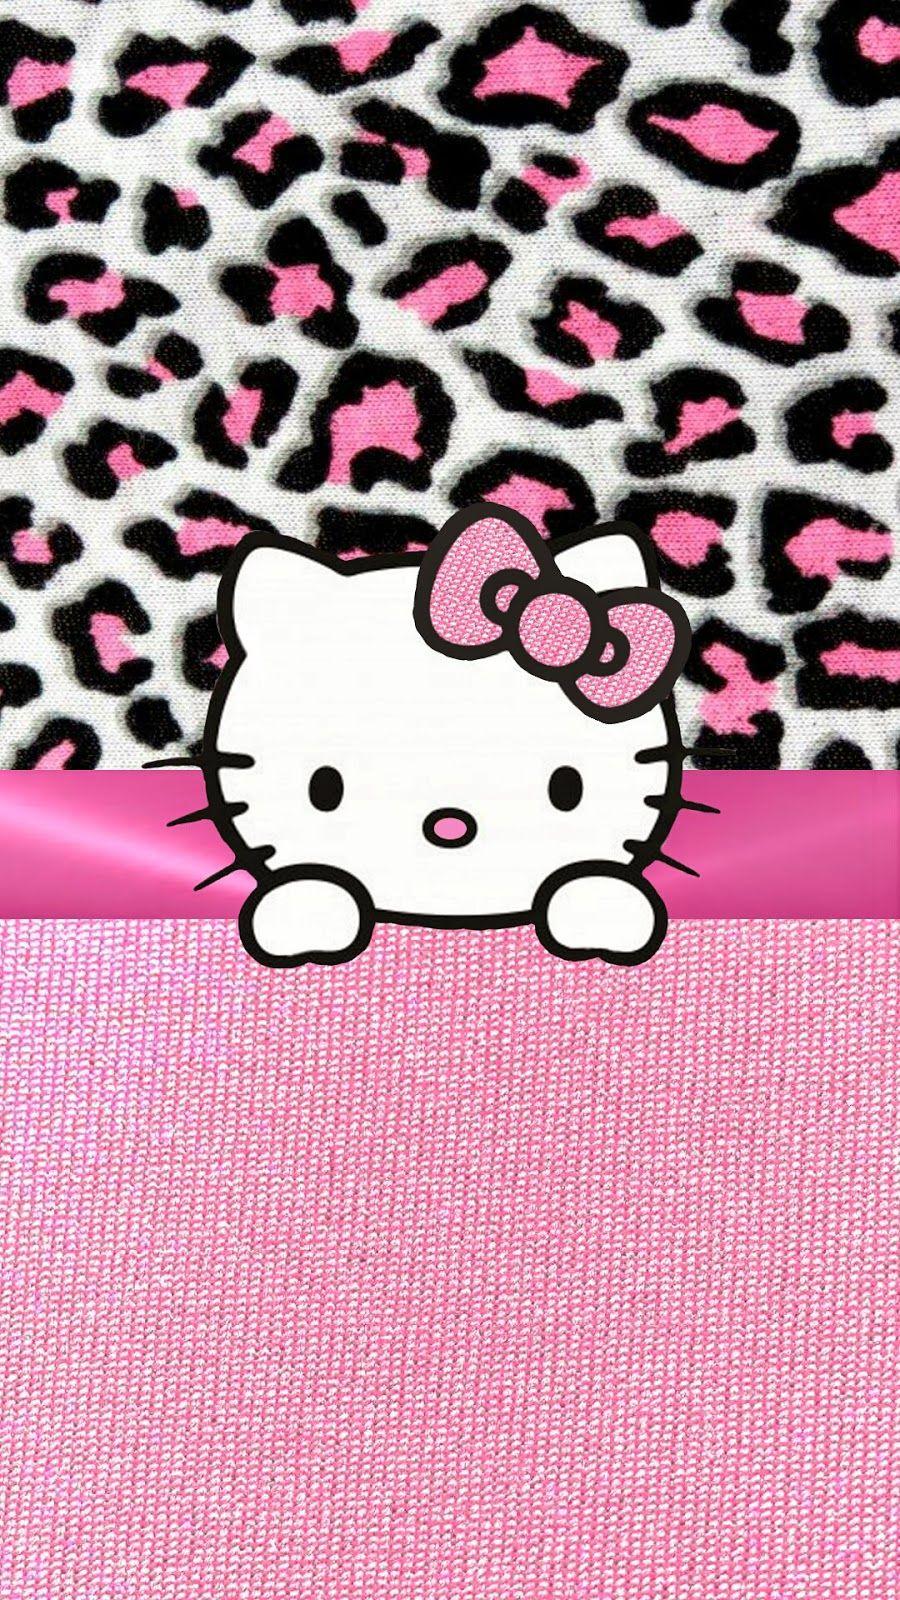 PINK HELLO KITTY IPHONE WALLPAPER BACKGROUND Hello kitty